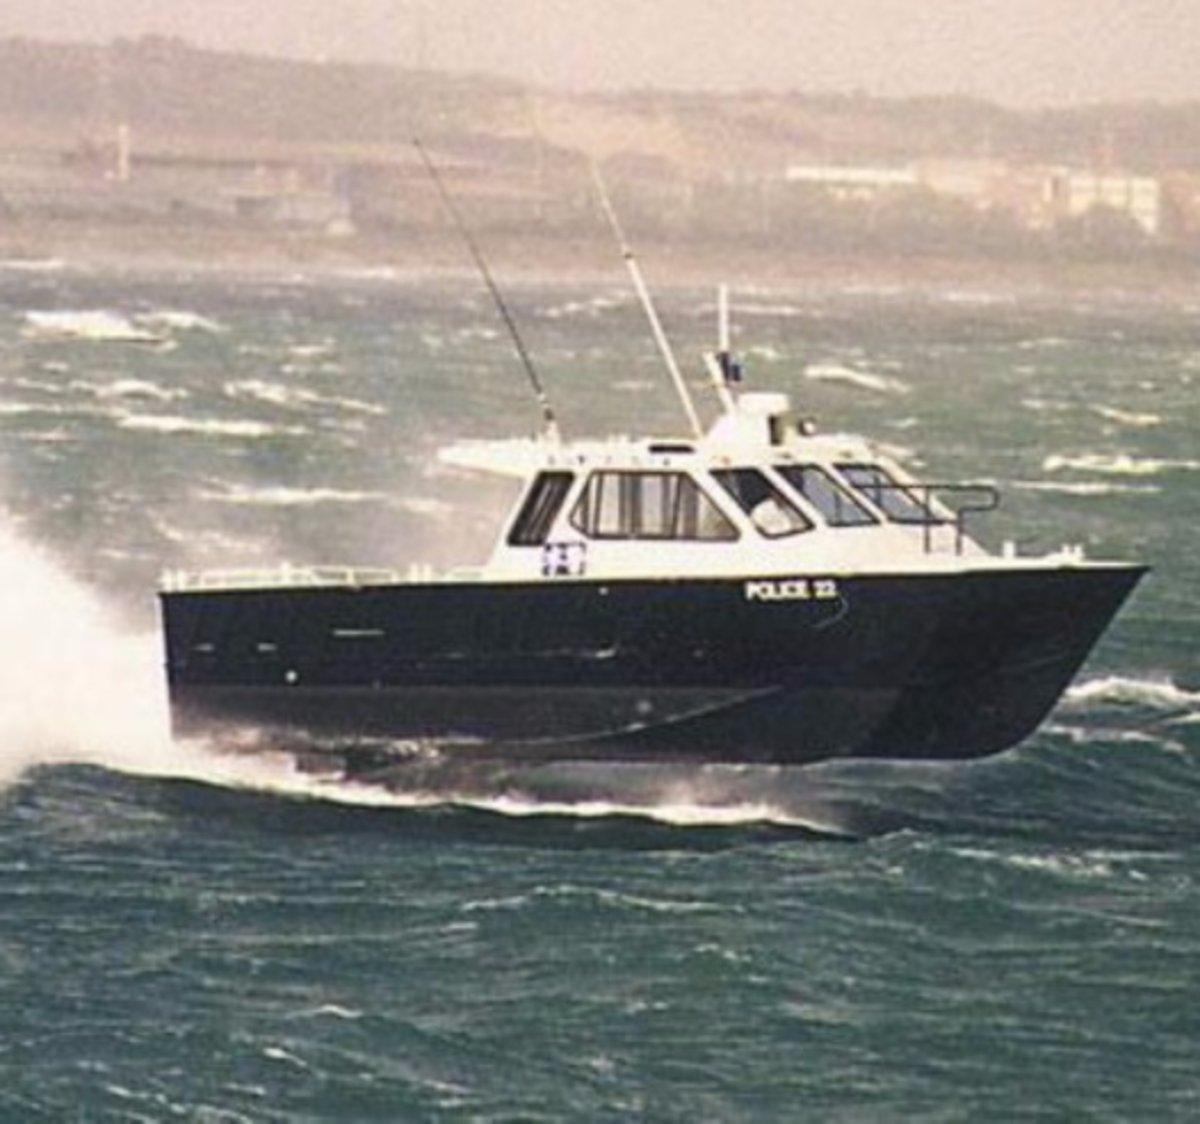 10m Patrol Boat